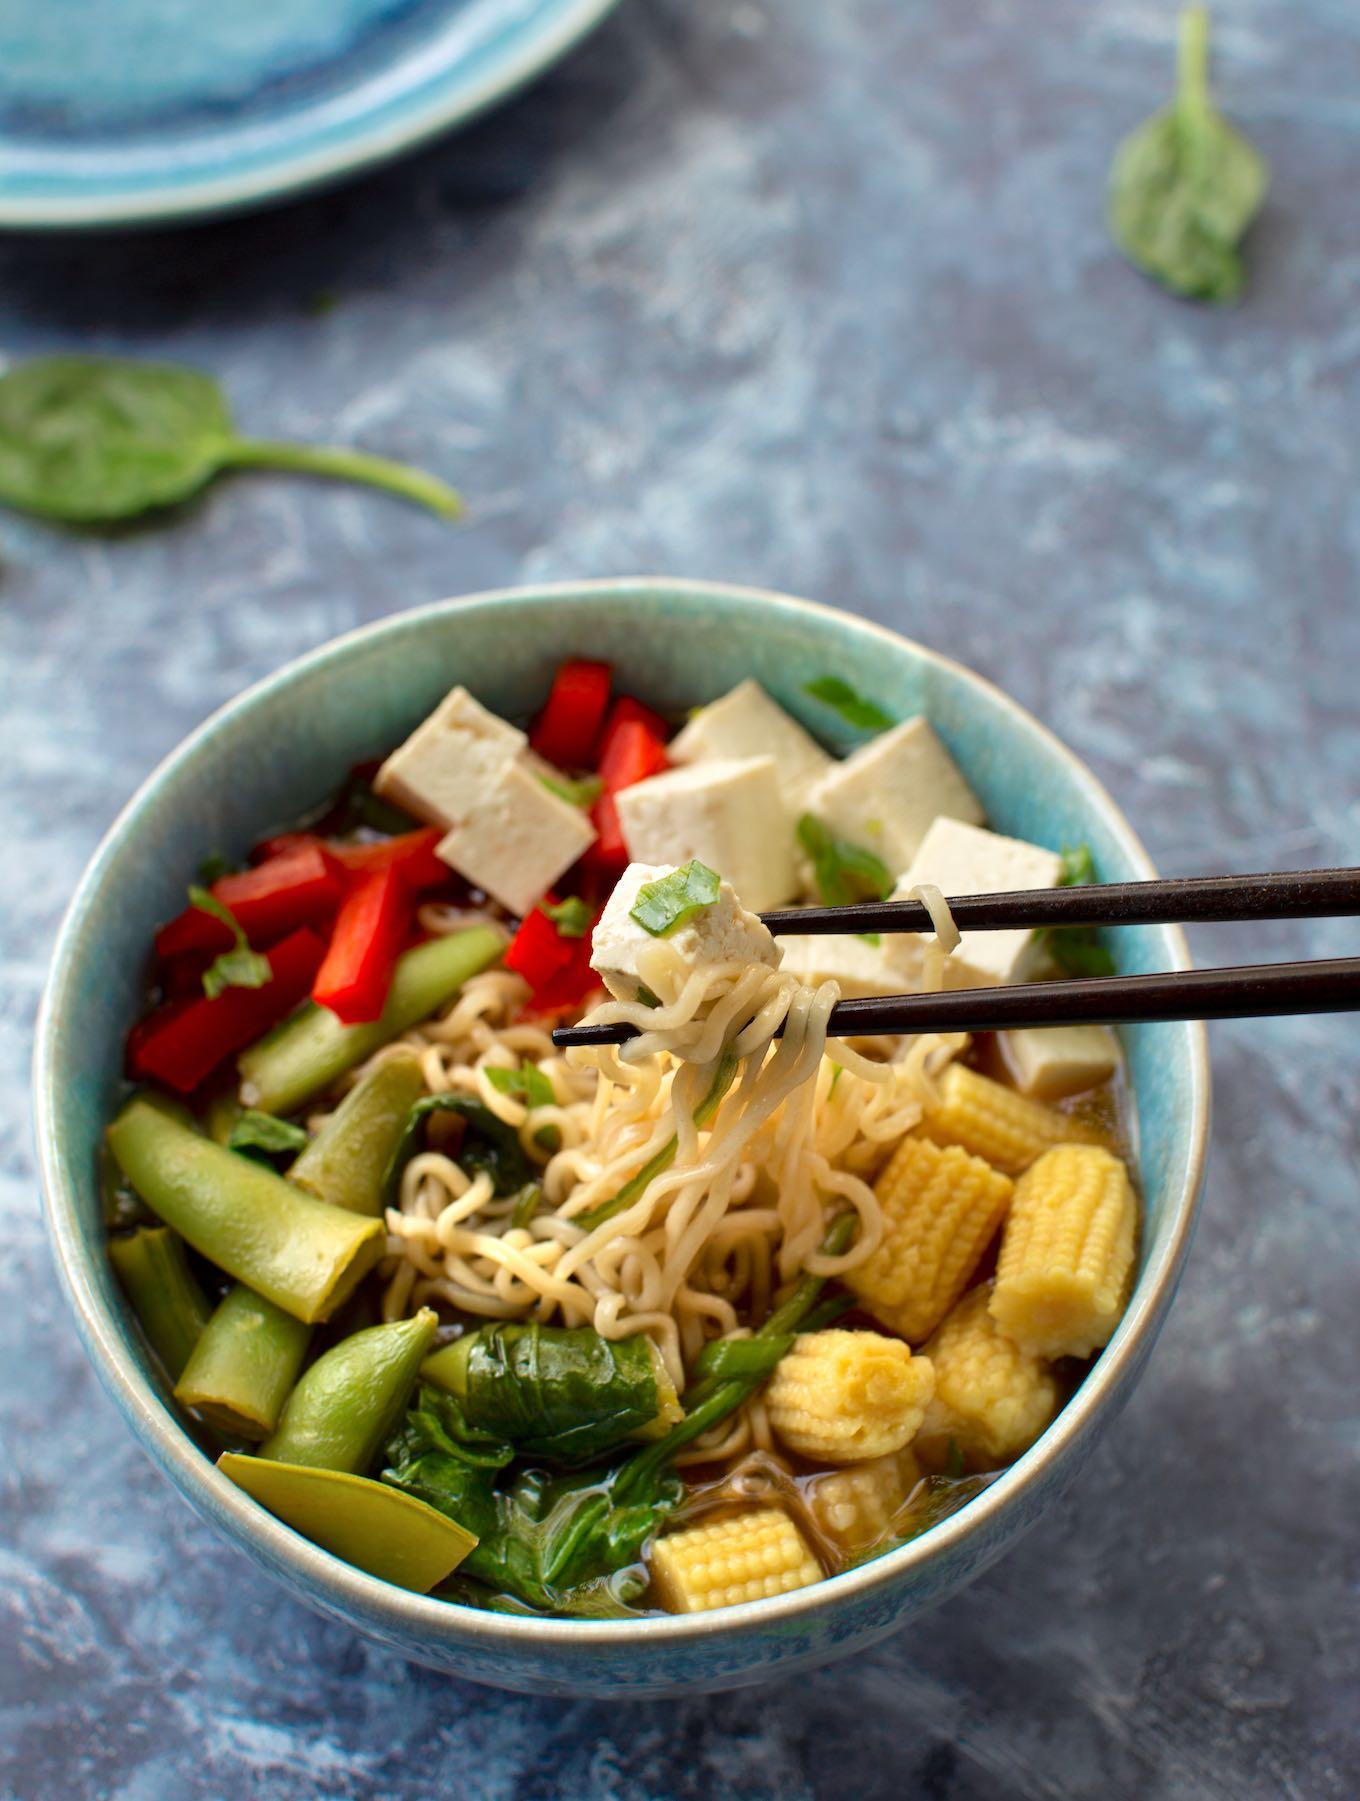 Ramen Soup with Tofu and Vegetables - vegan